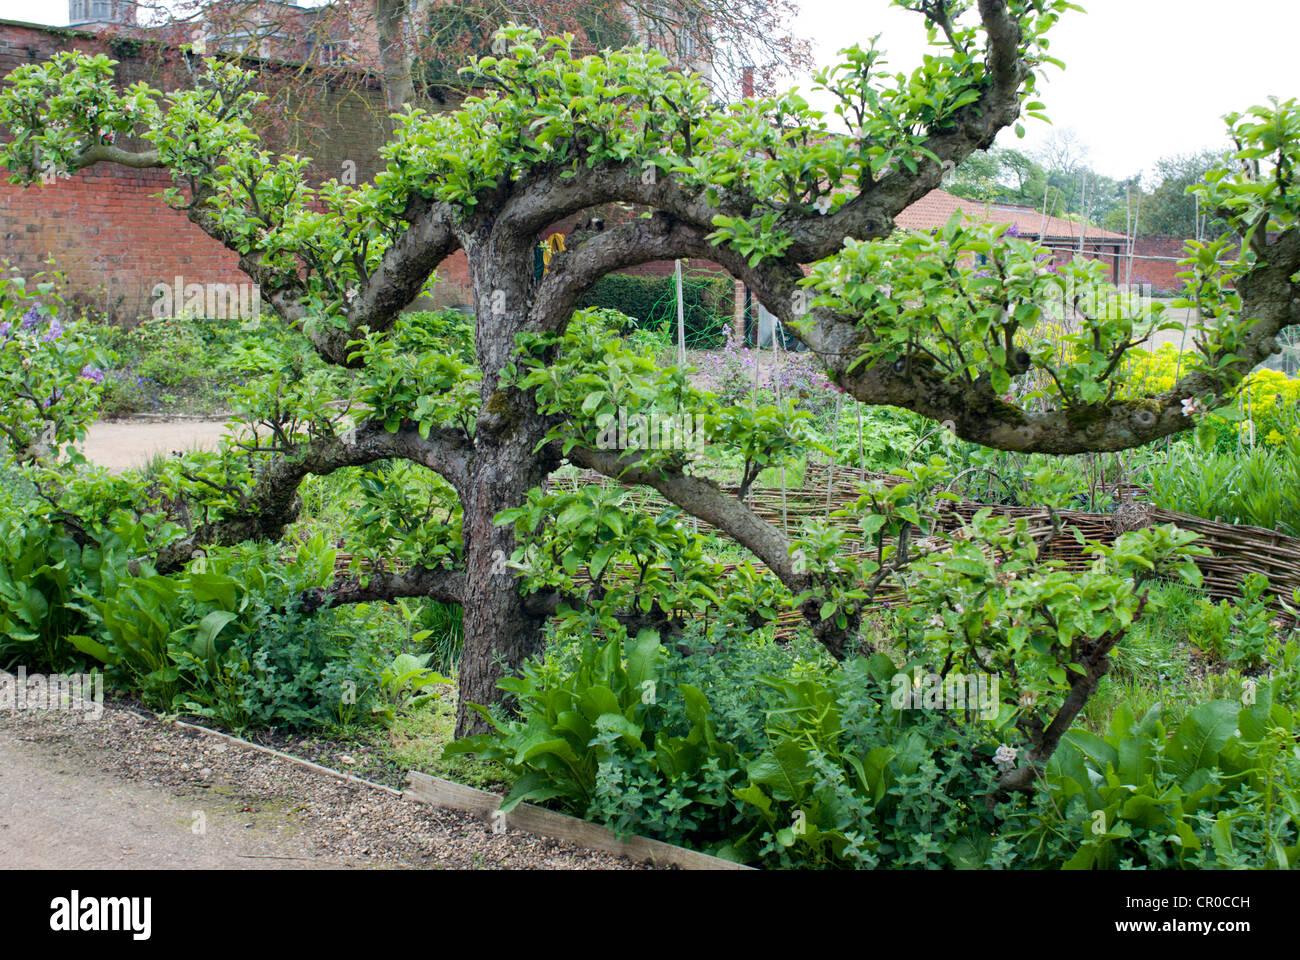 Lovely Espalier Apple Tree Growing In A Country Walled Garden